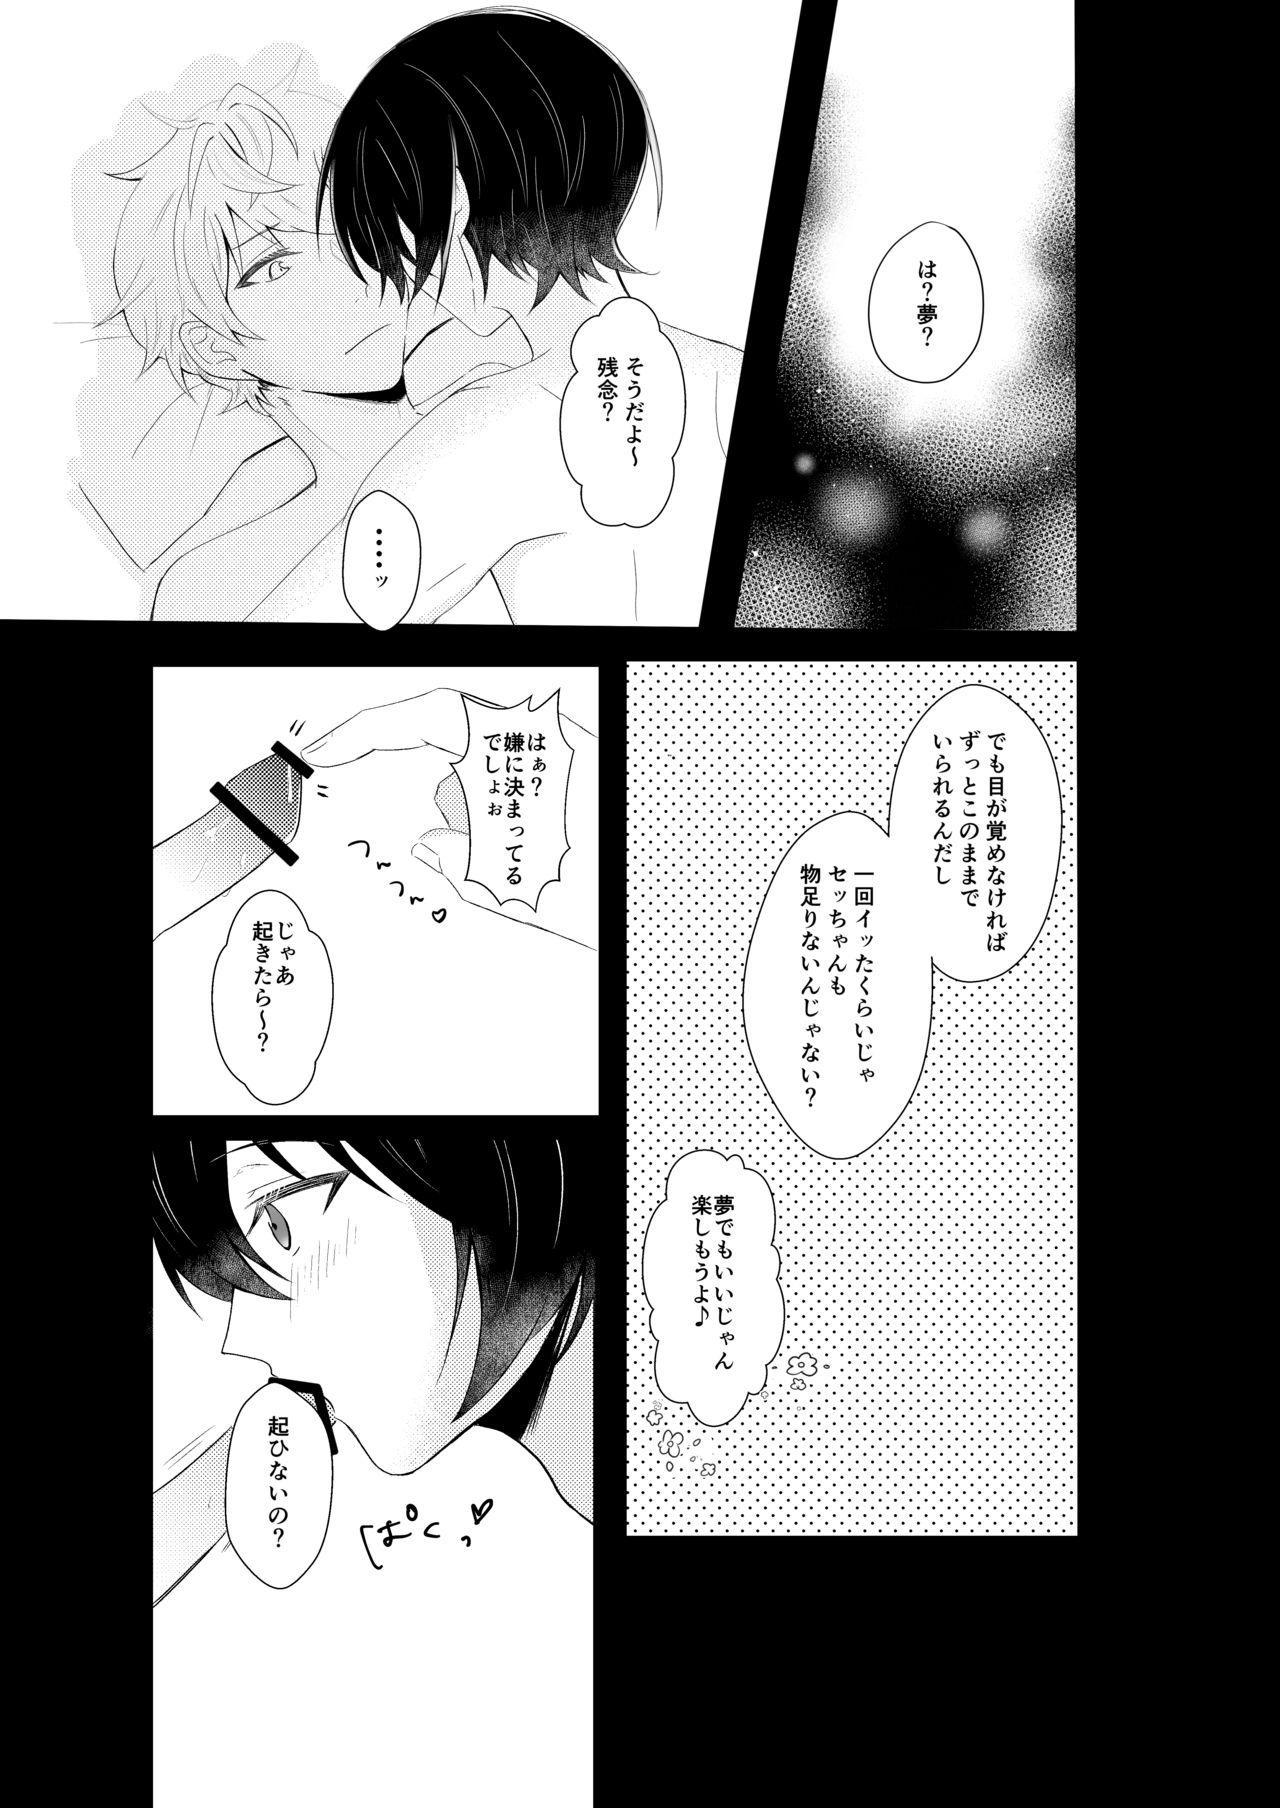 Midnight dream 9